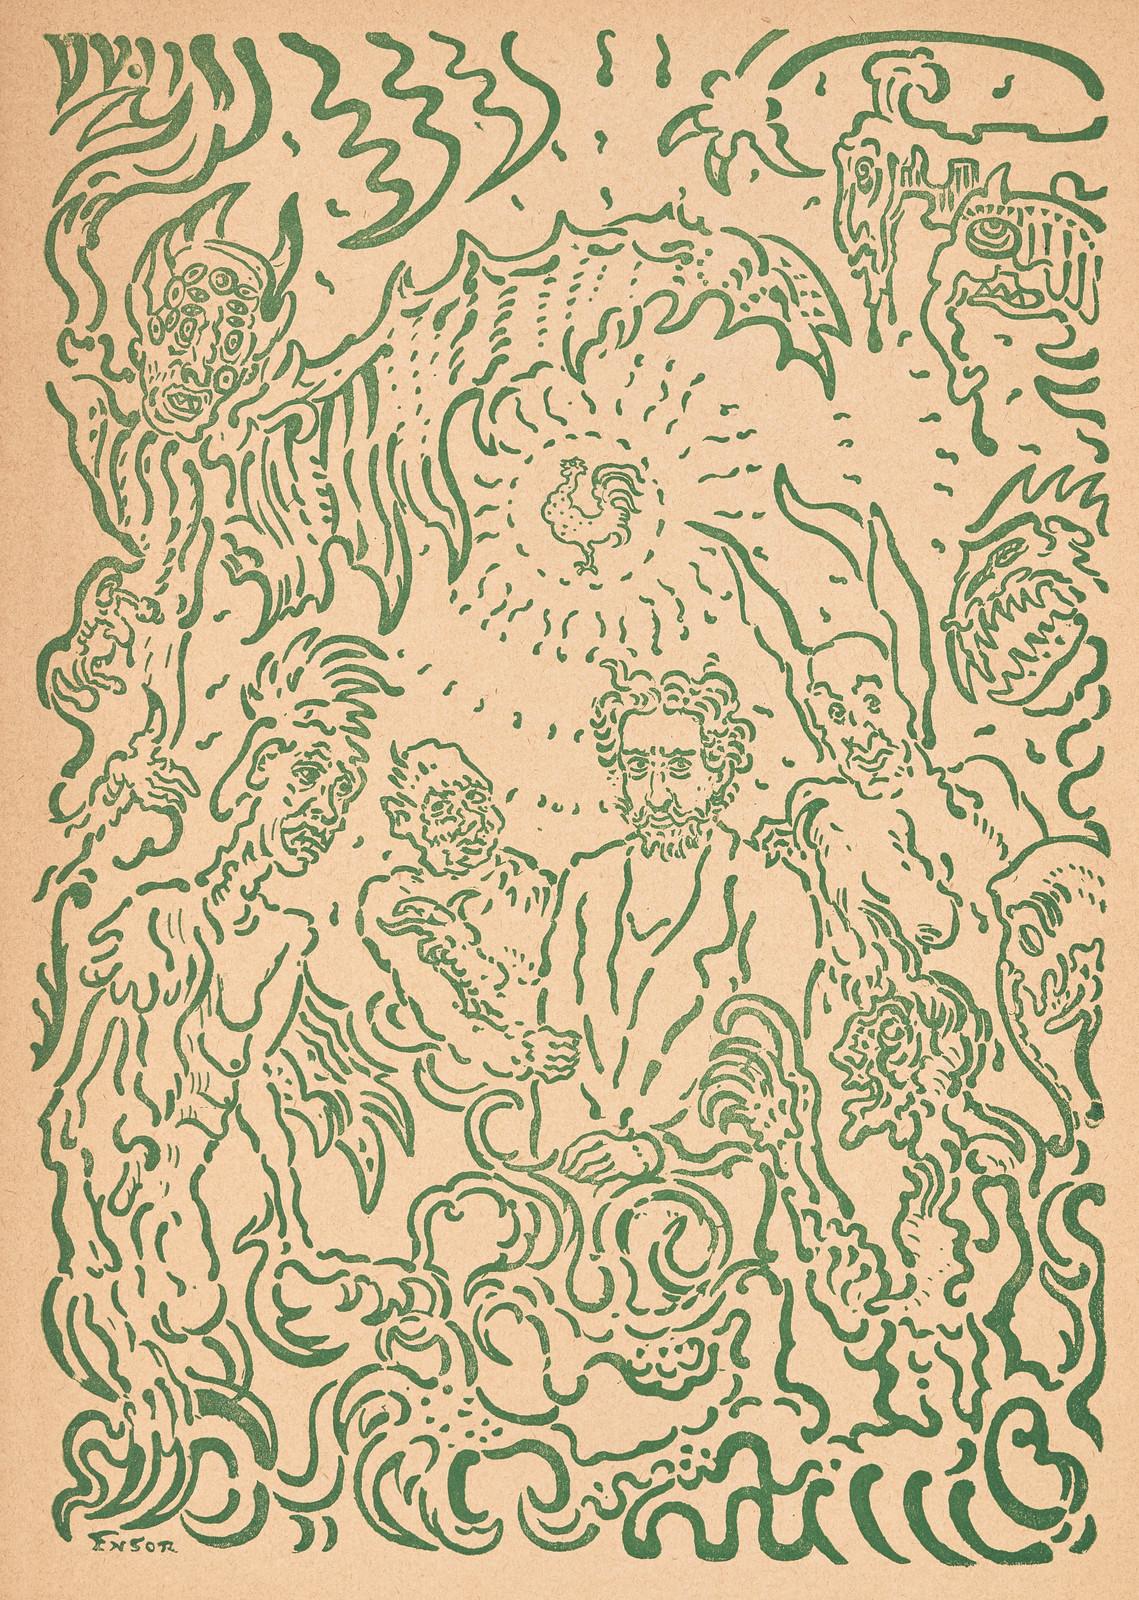 James Ensor - Demons Teasing Me, 1898